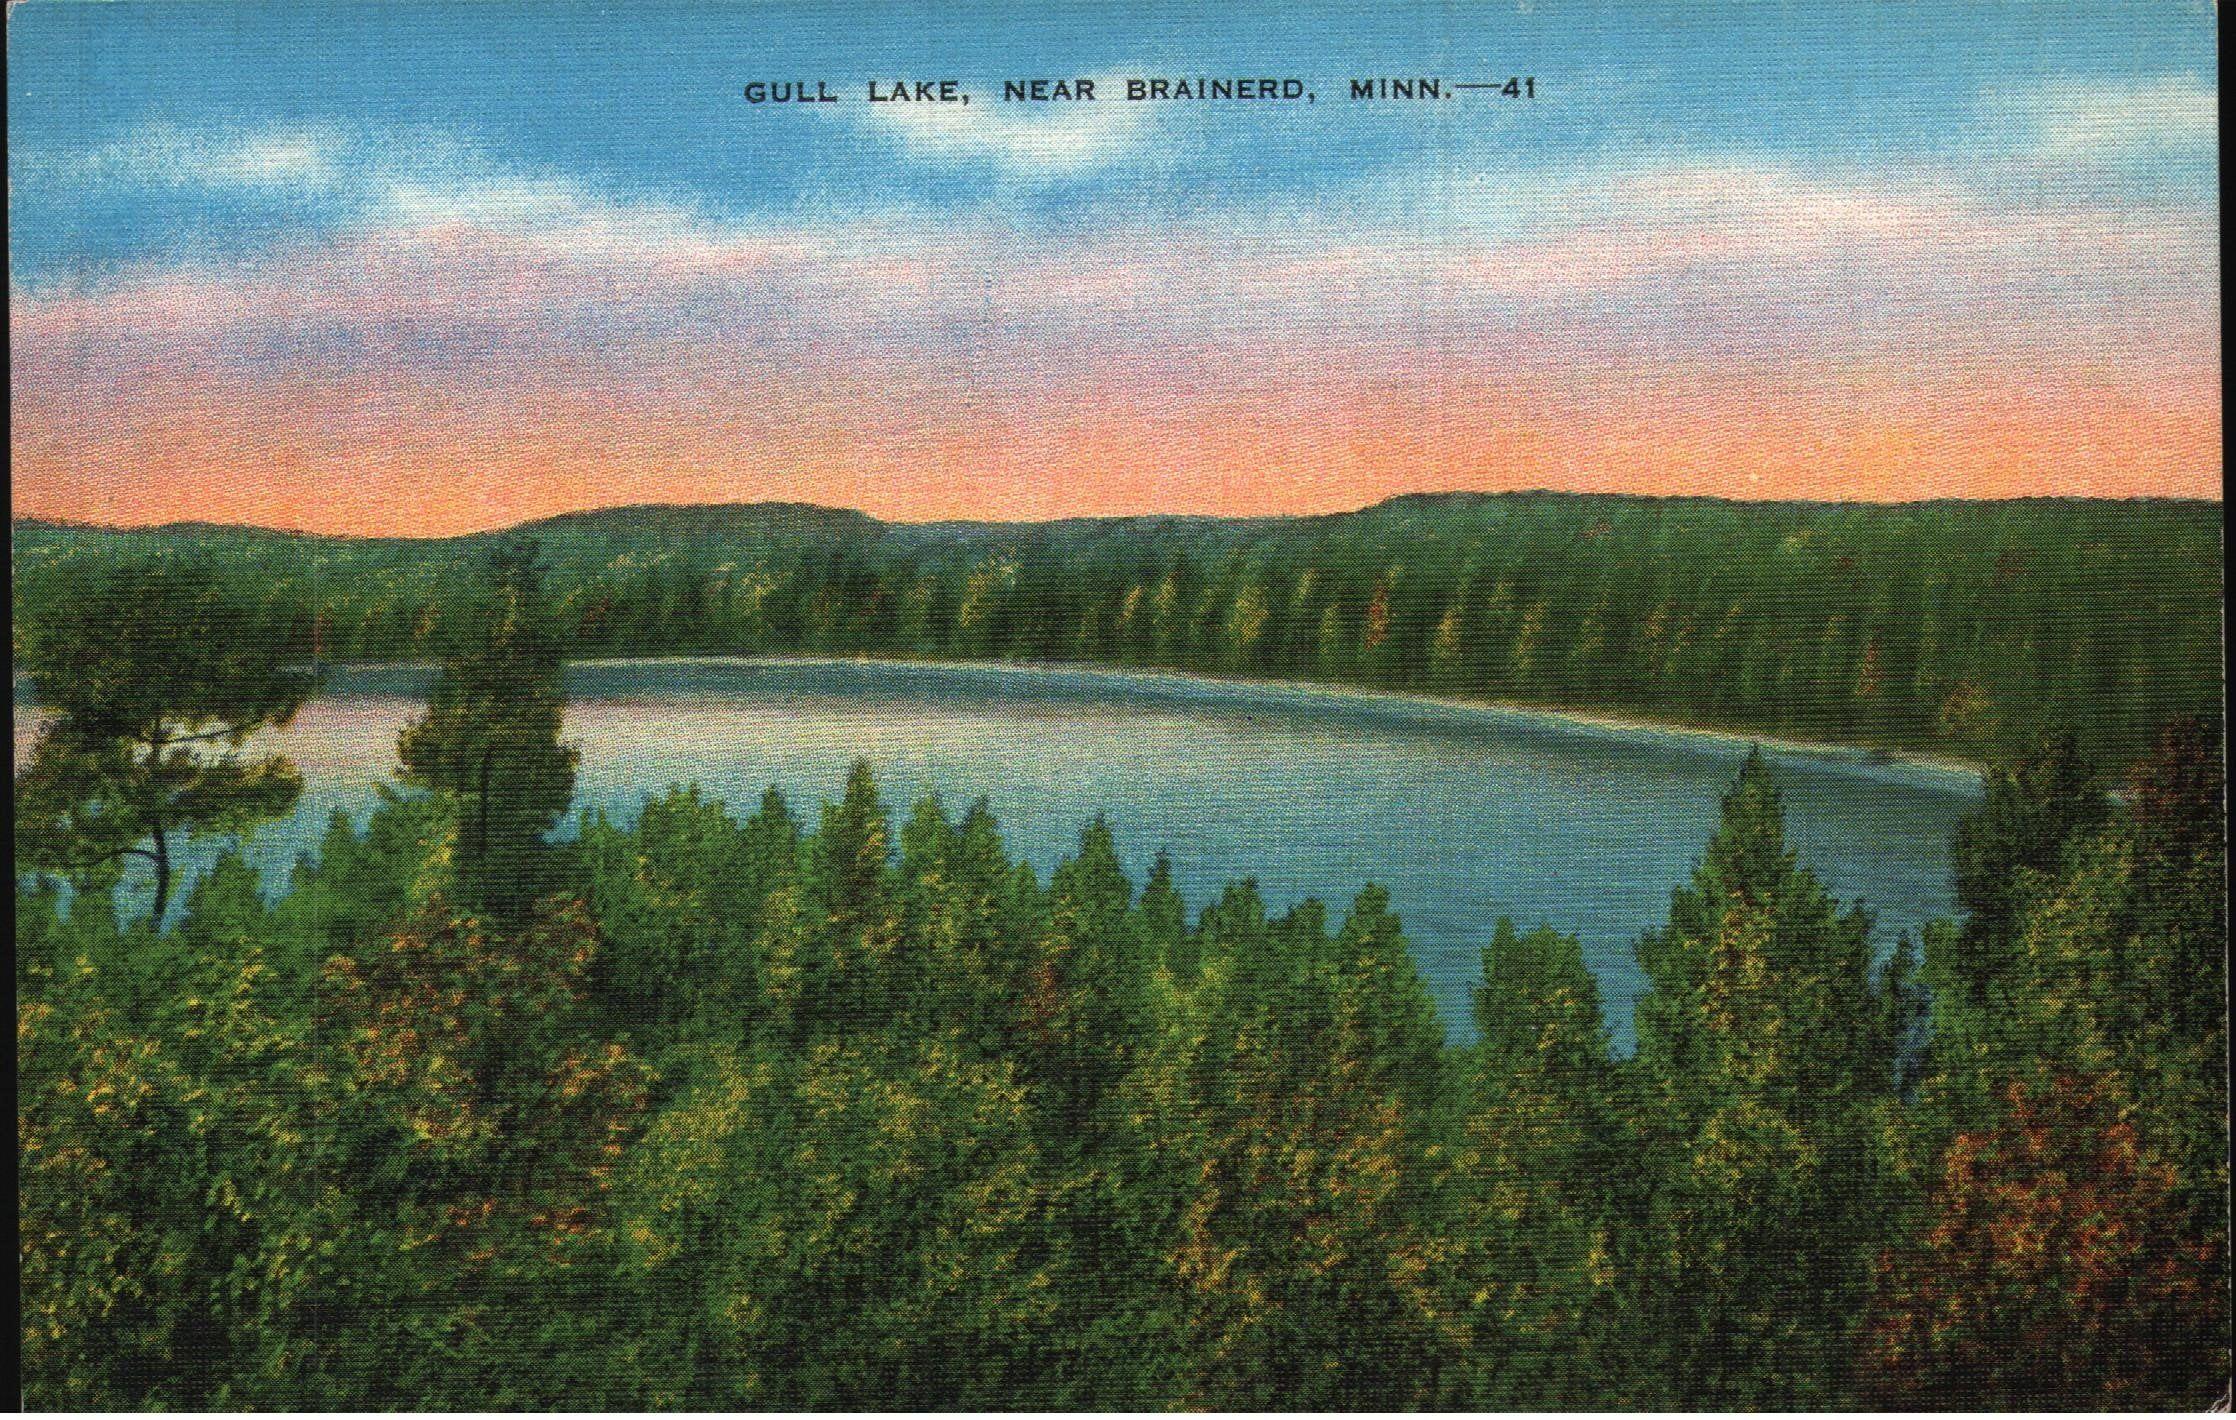 Pin on Postcard Passion